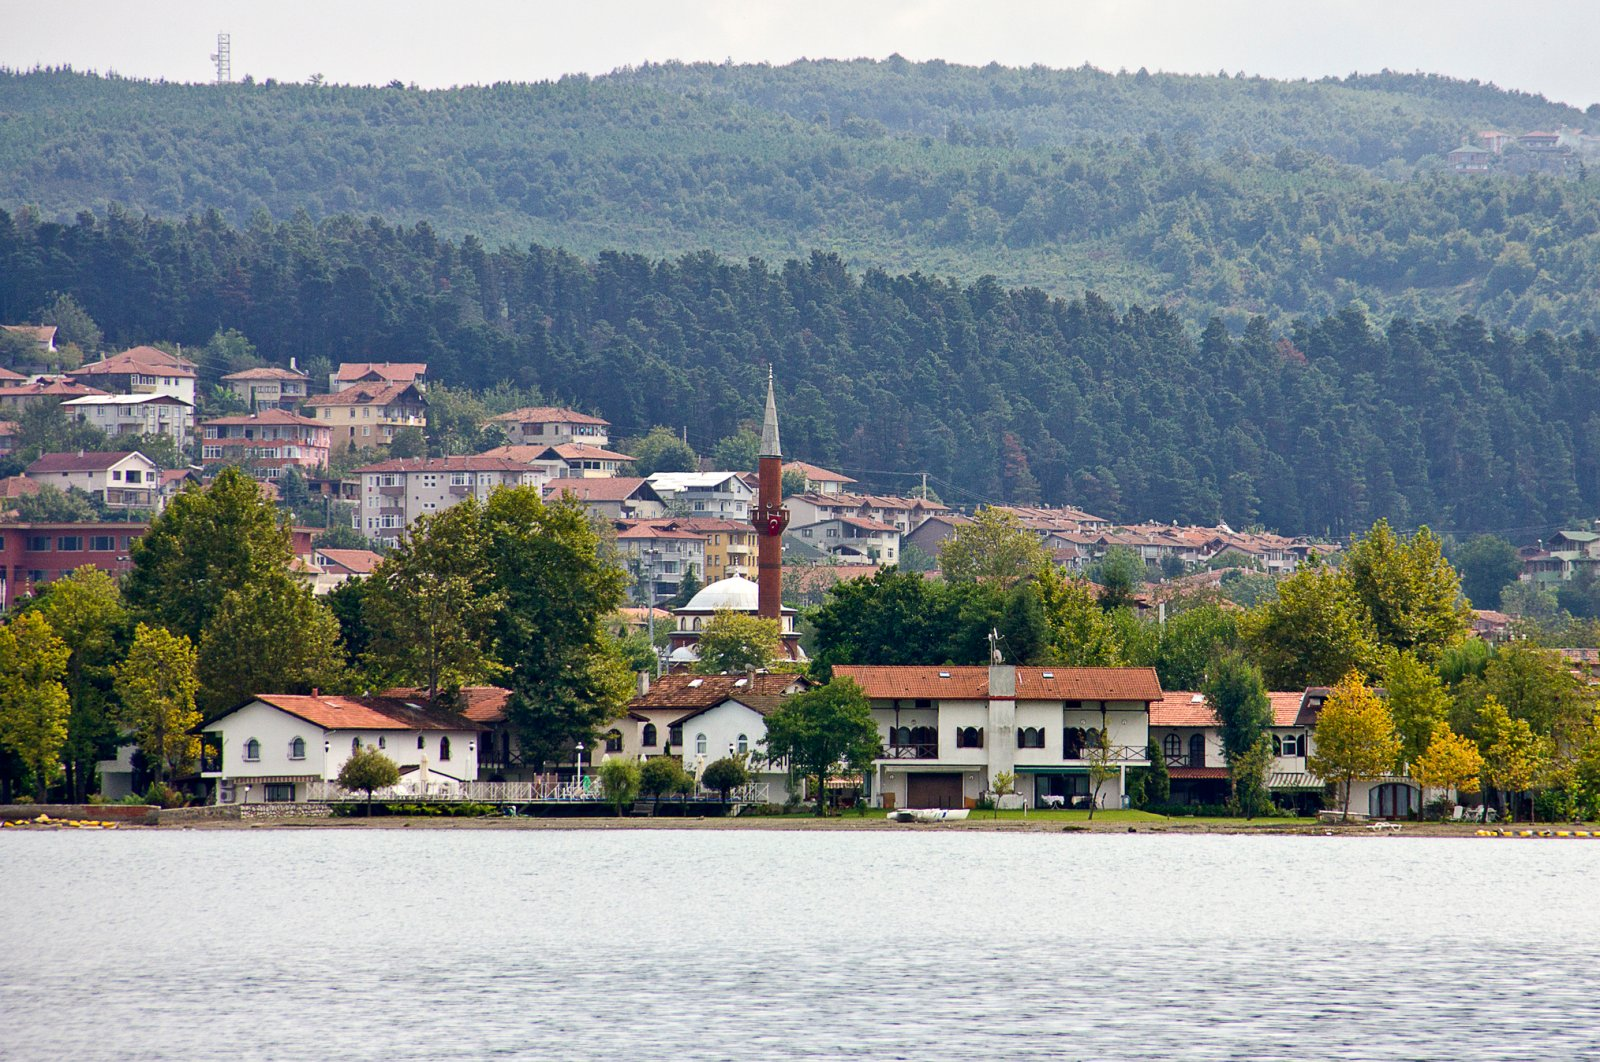 The city of Sapanca and Harmanlık Mosque (C) seen from across Sapanca Lake, Sakarya, Turkey. (iStock Photo)